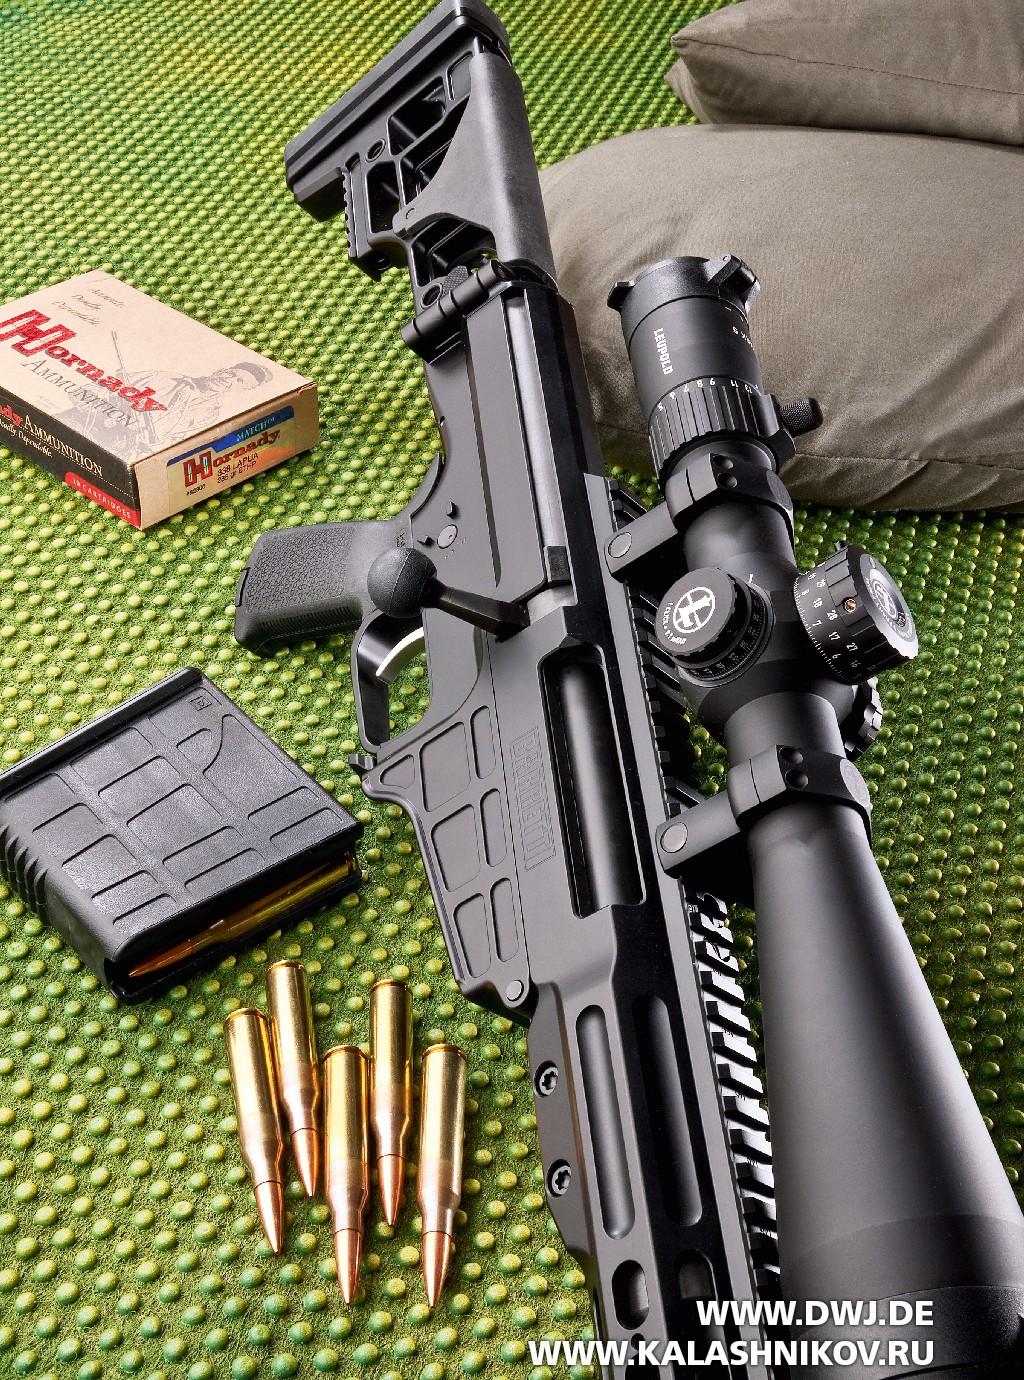 Тактическая винтовка Barrett MRAD с патронами